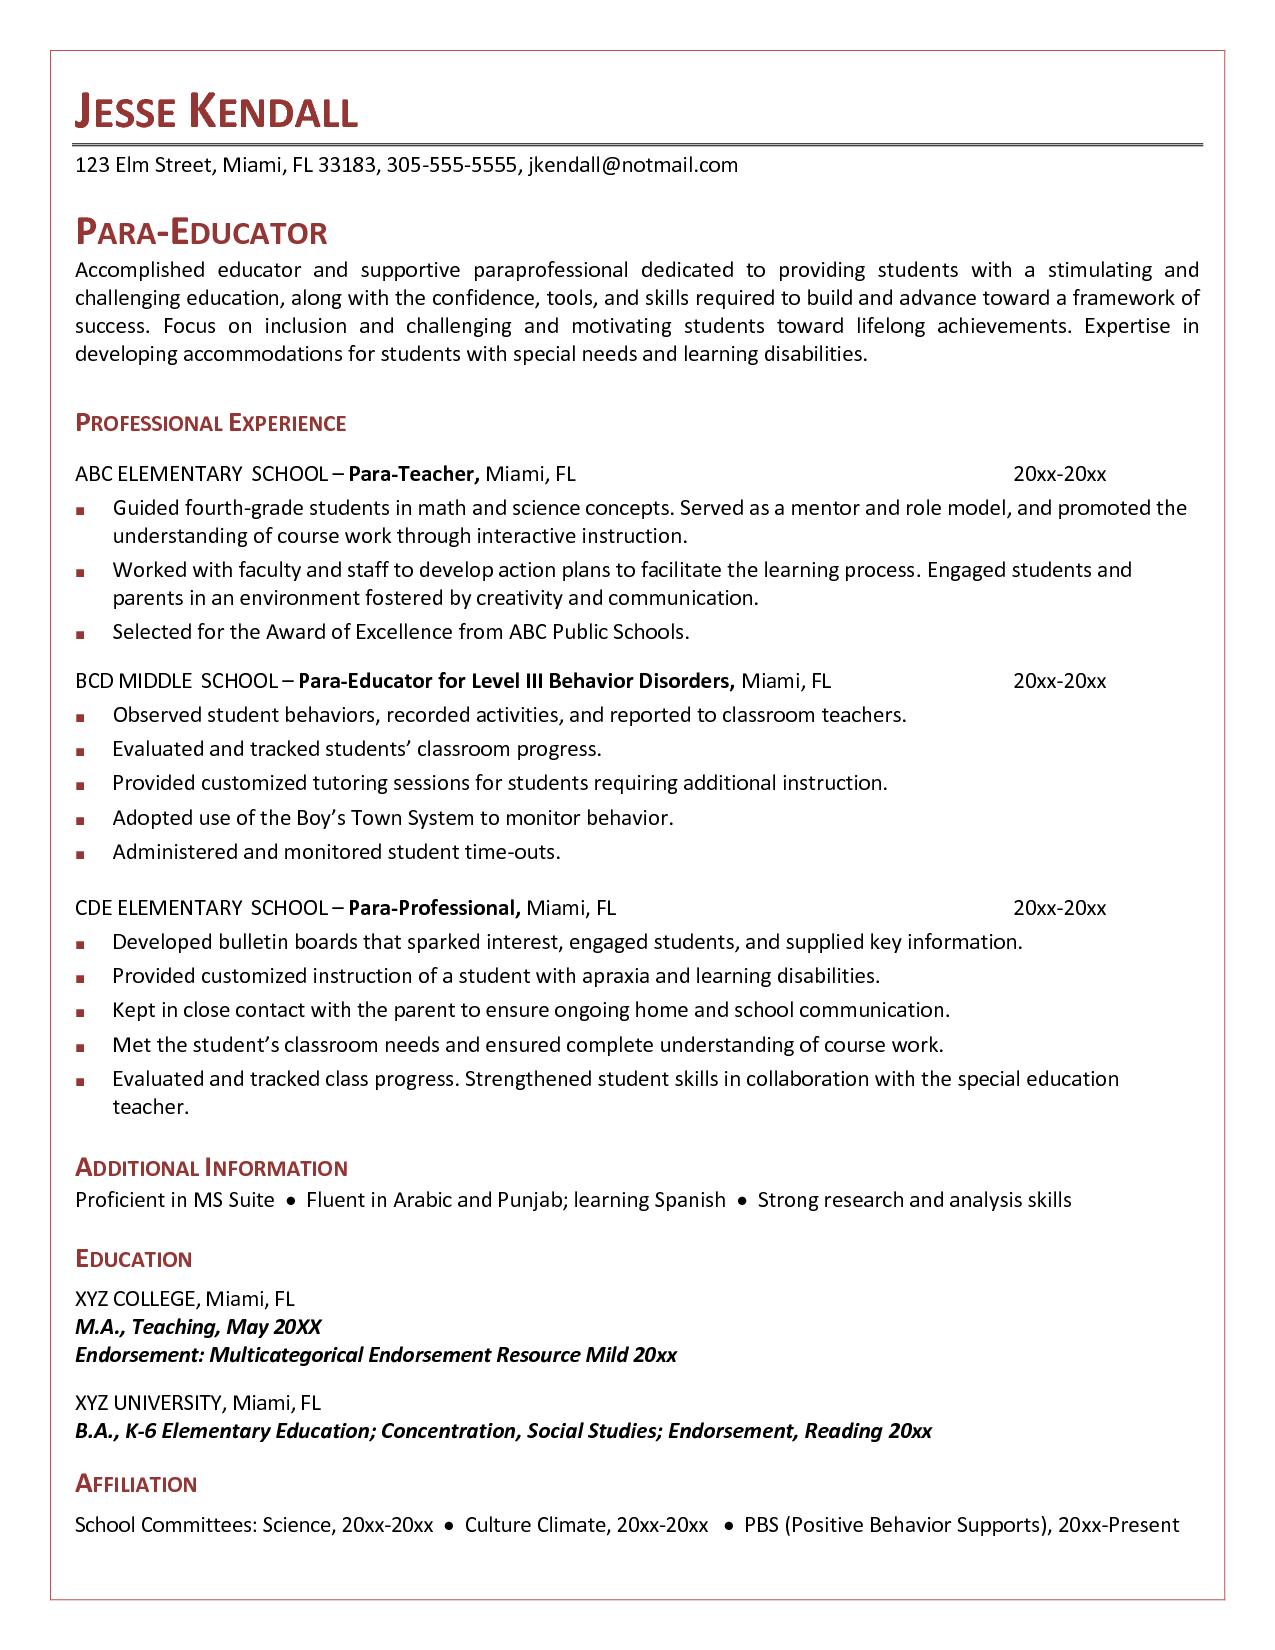 Cover Letter For Paraeducator Example Resumecareer Info